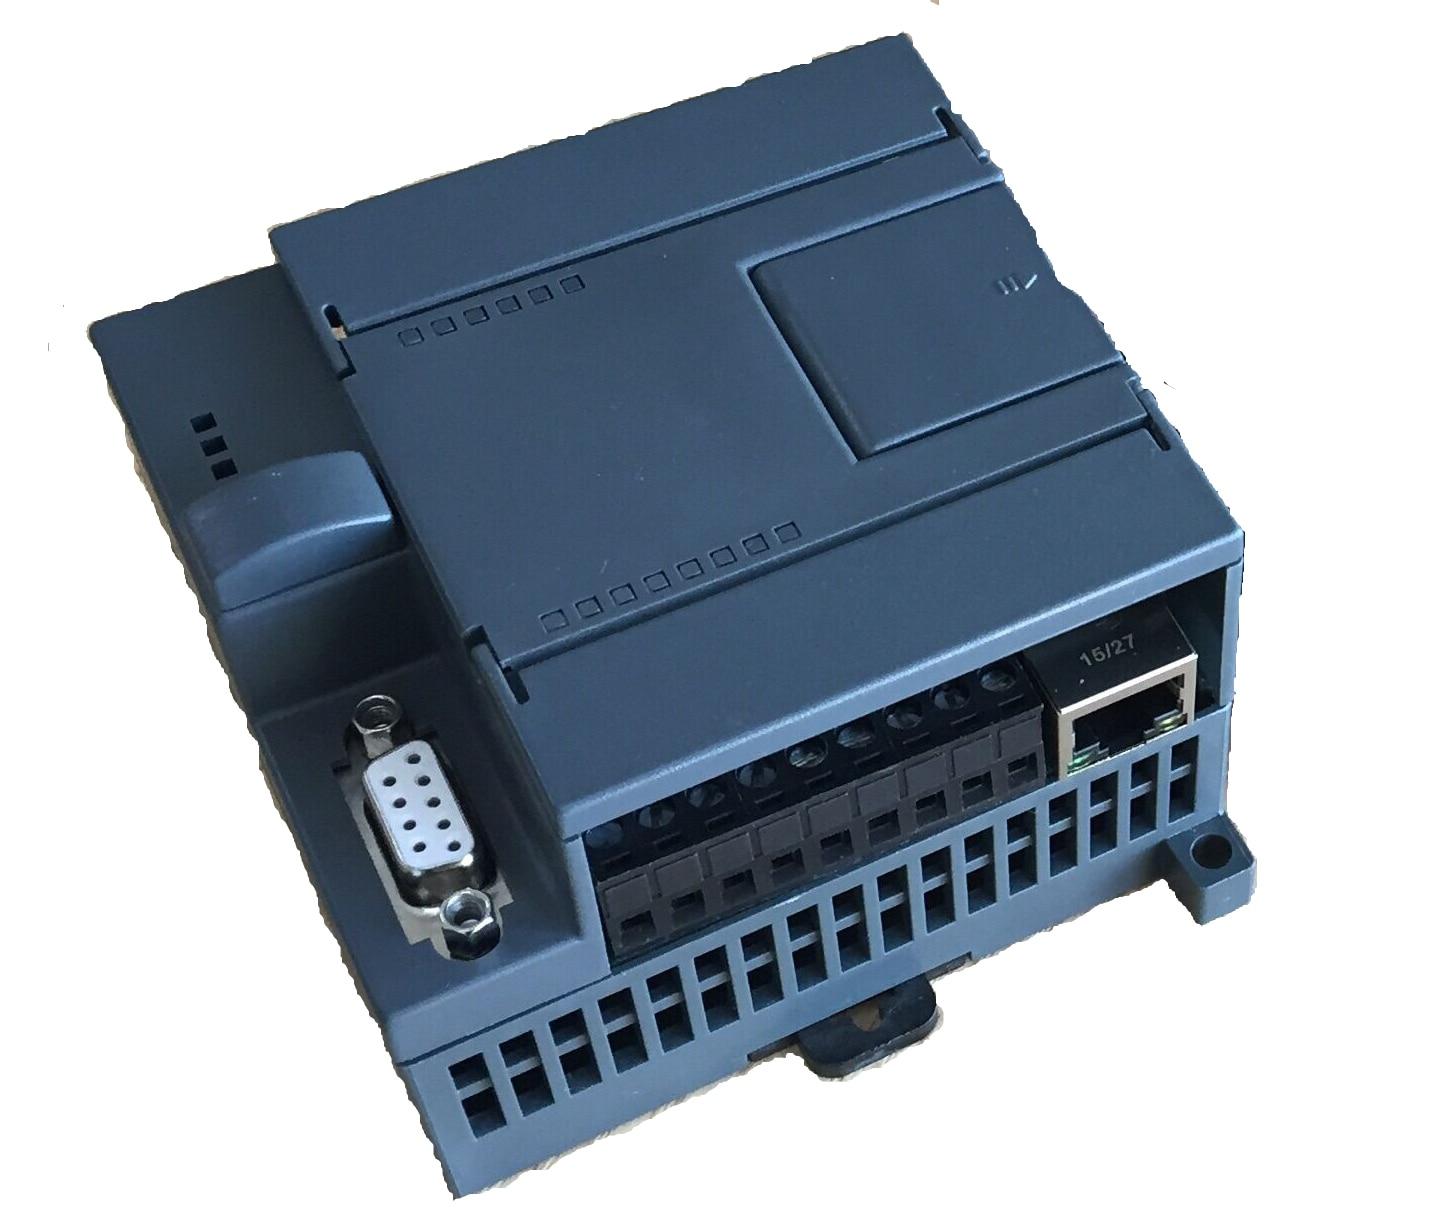 High Quality CPU224 PLC with Ethernet for S7 200 6DI 6DO 24VDC Modbus RTU TCP WinCC